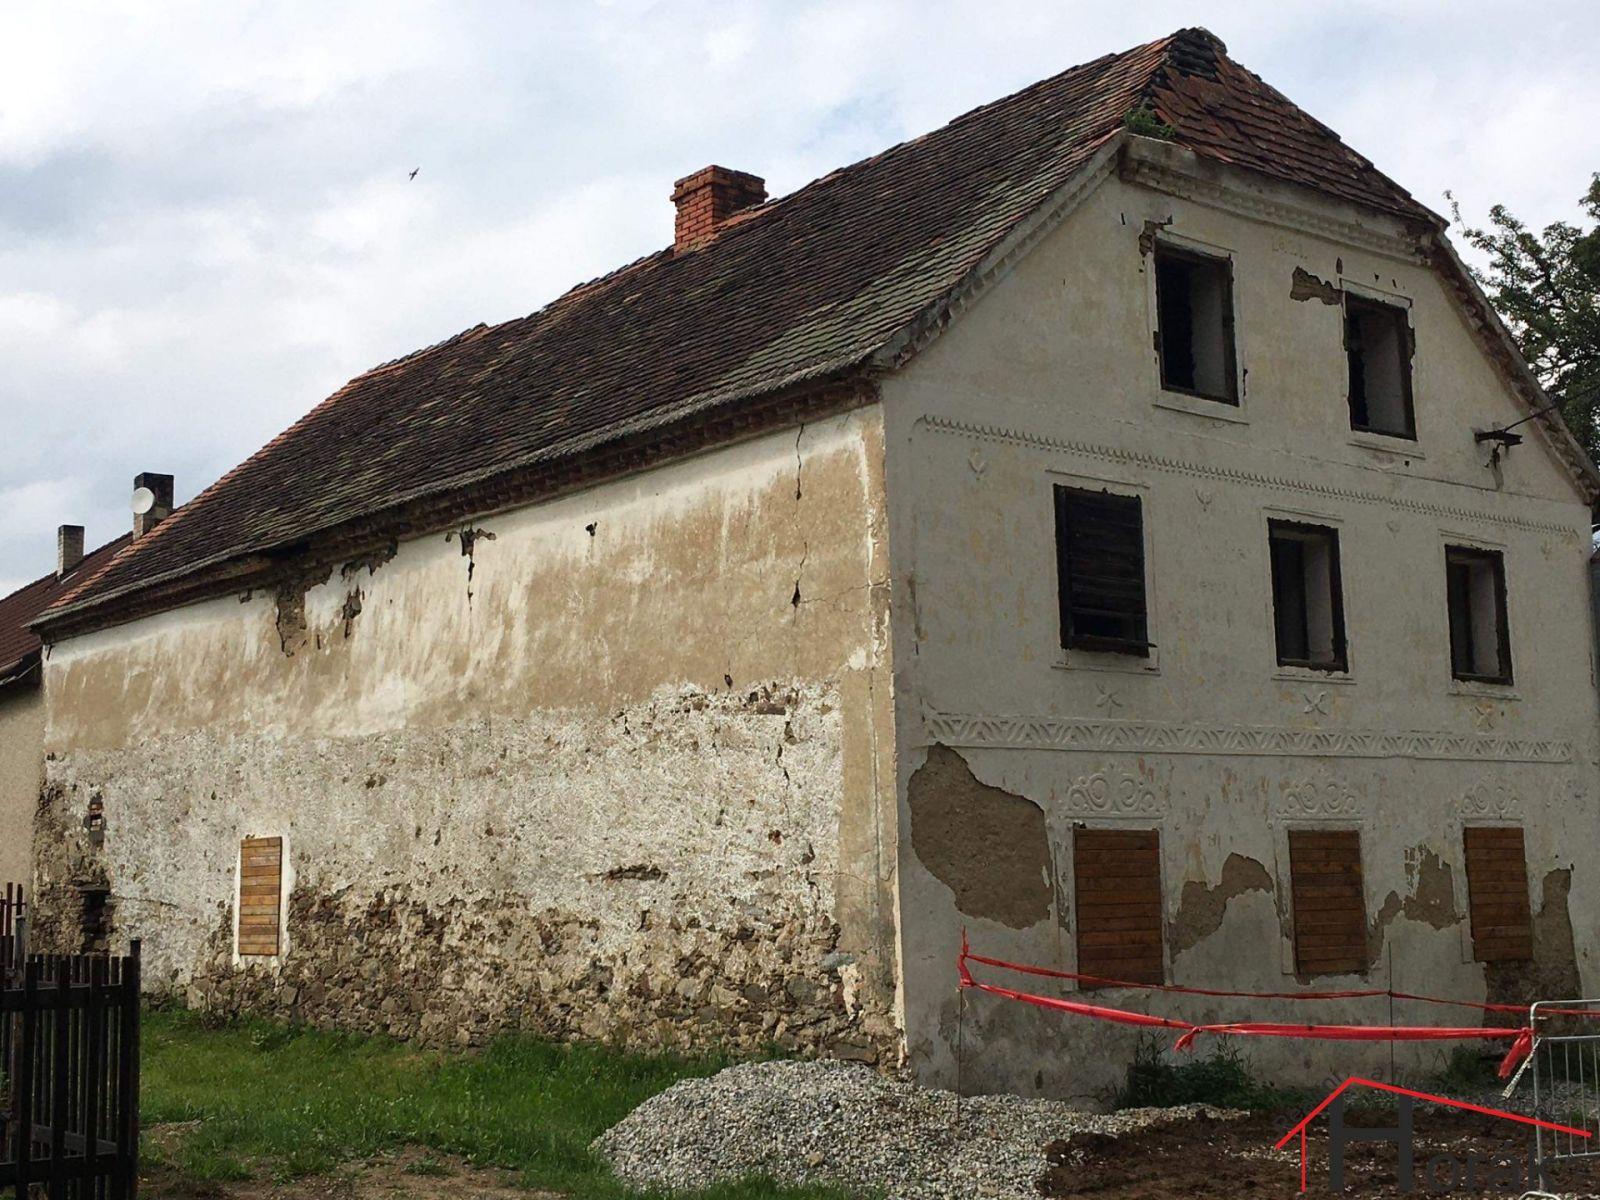 Prodej, Chalupa, 250 m2 - Chroboly - Ovesné